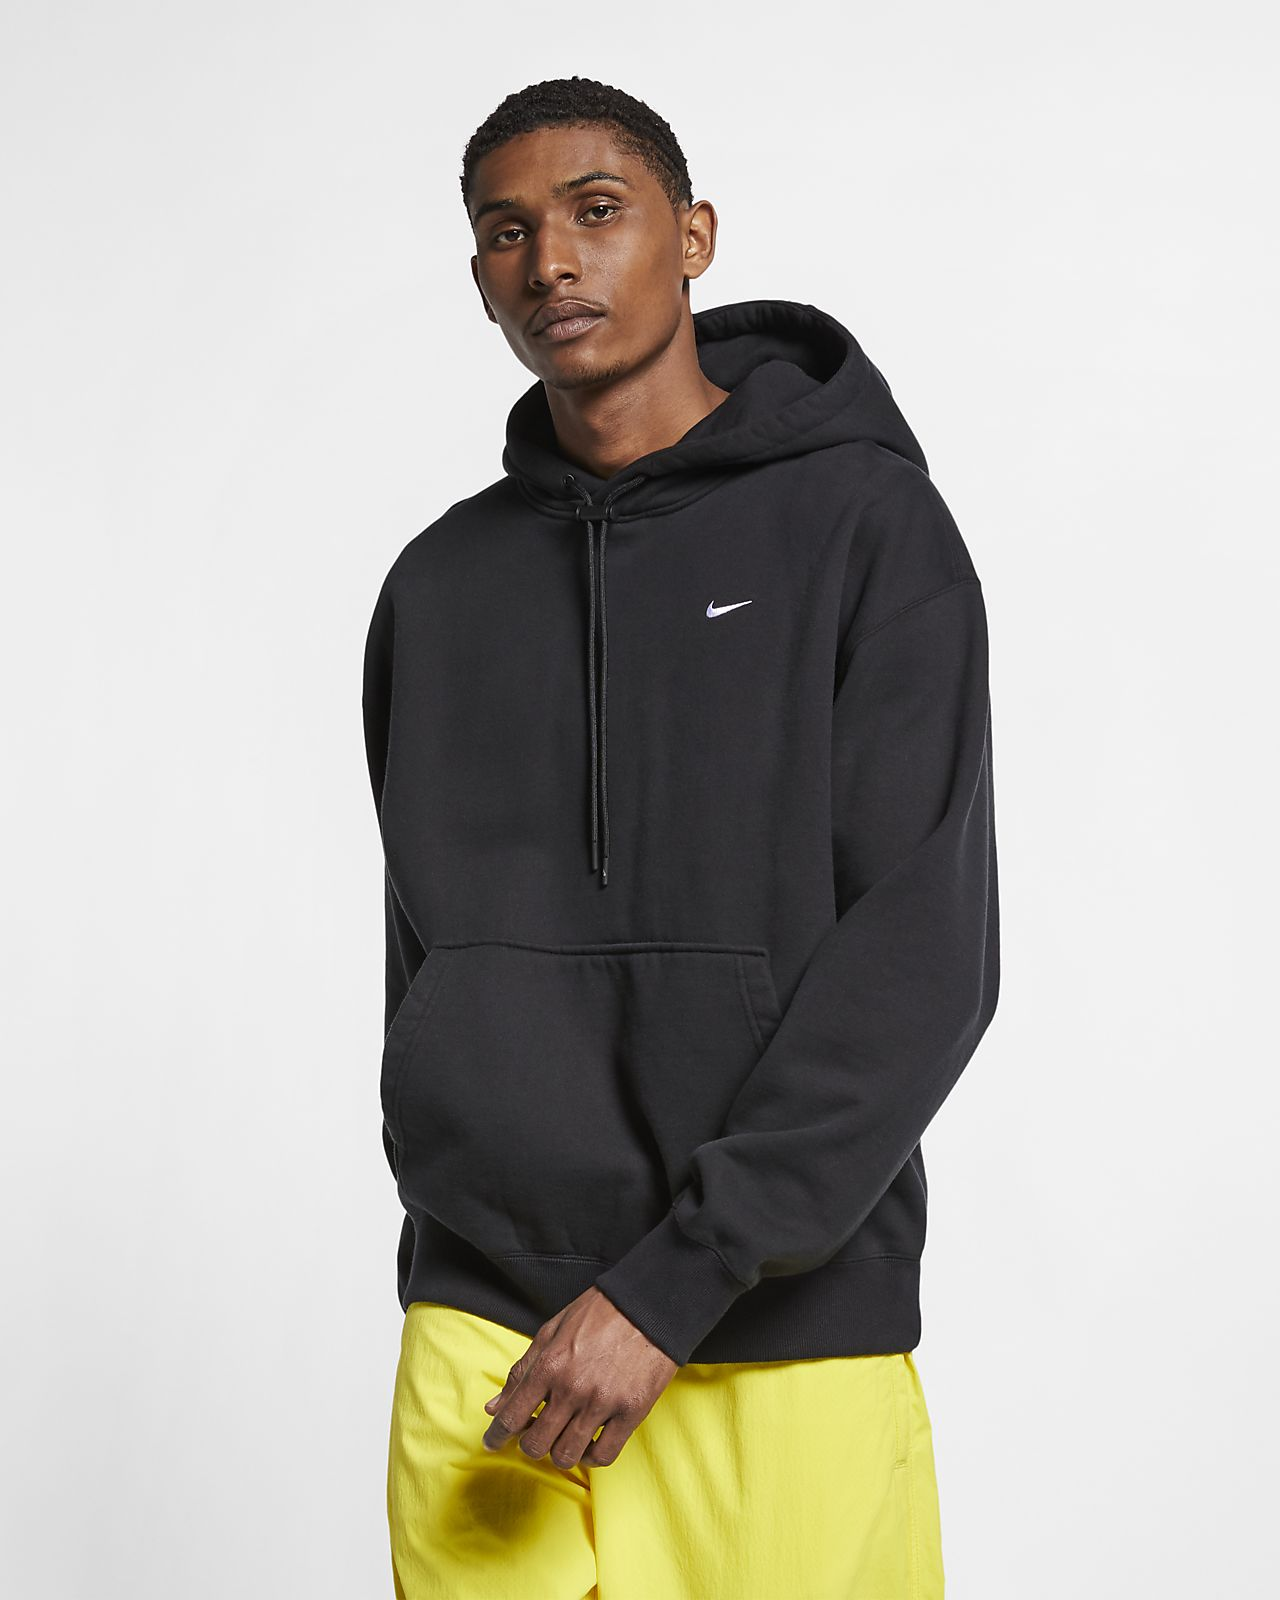 NikeLab Collection 男款套頭連帽上衣